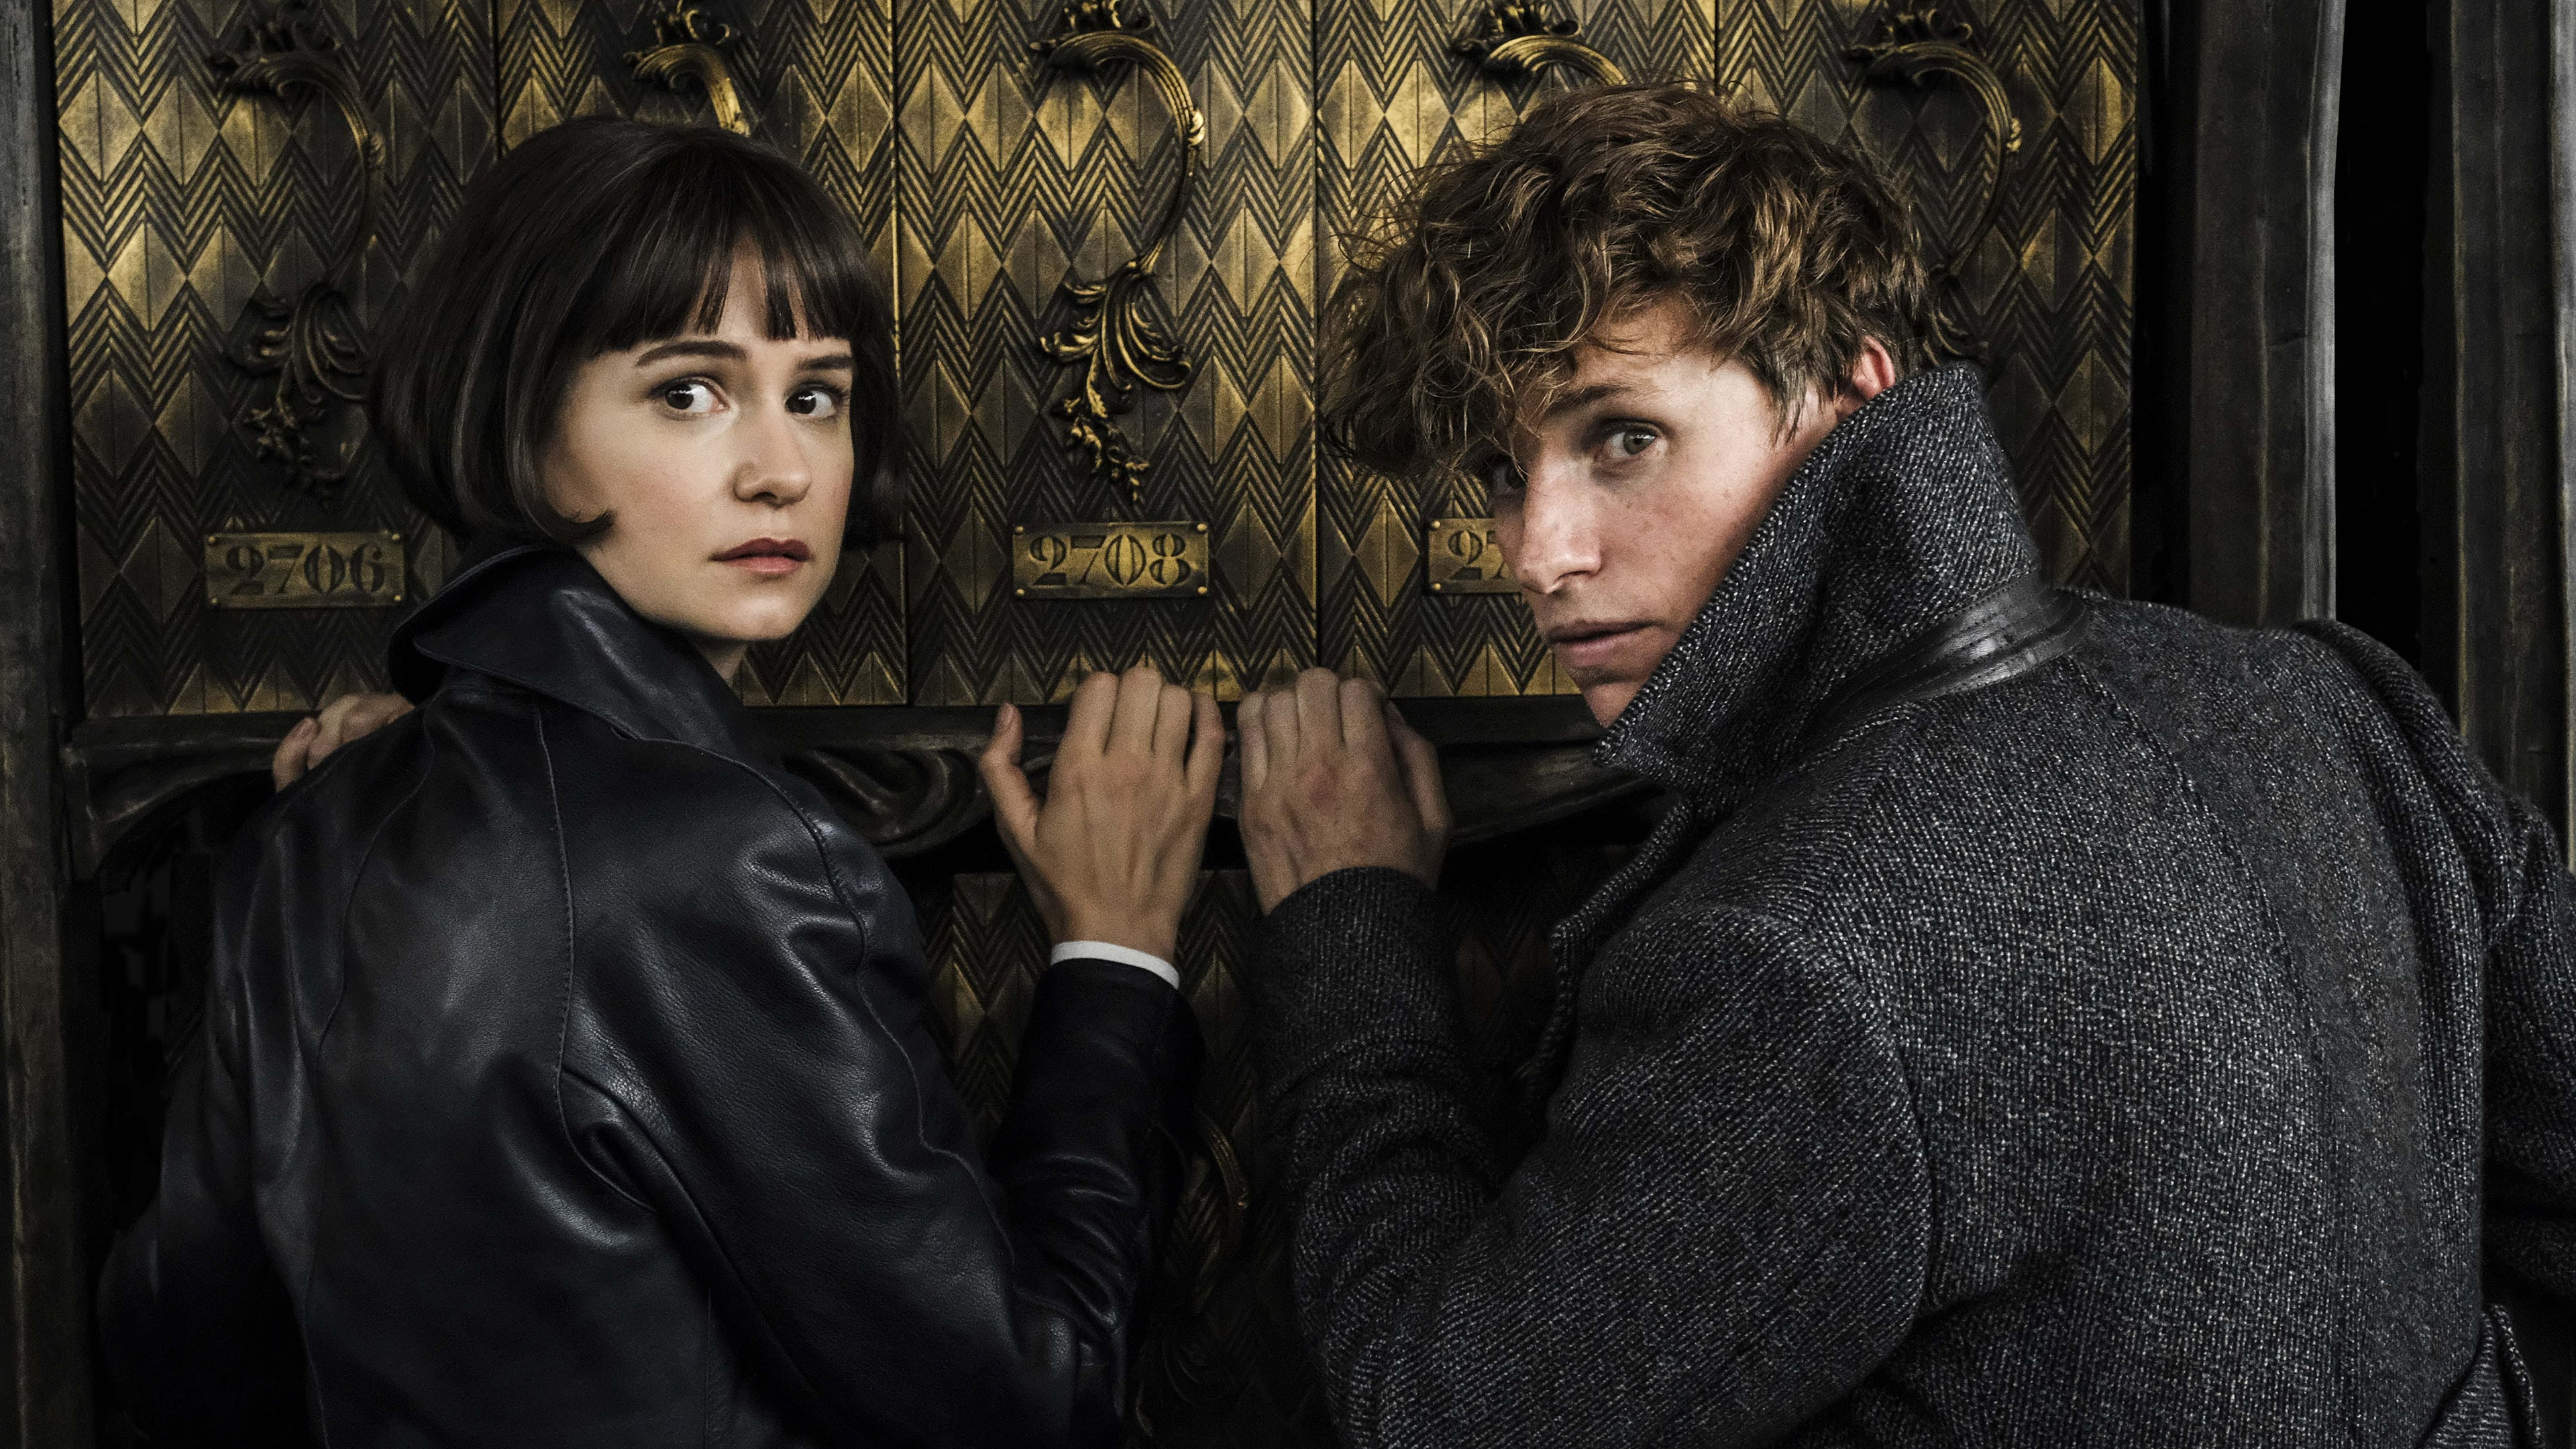 Fantastic Beasts: The Crimes of Grindelwald backdrop